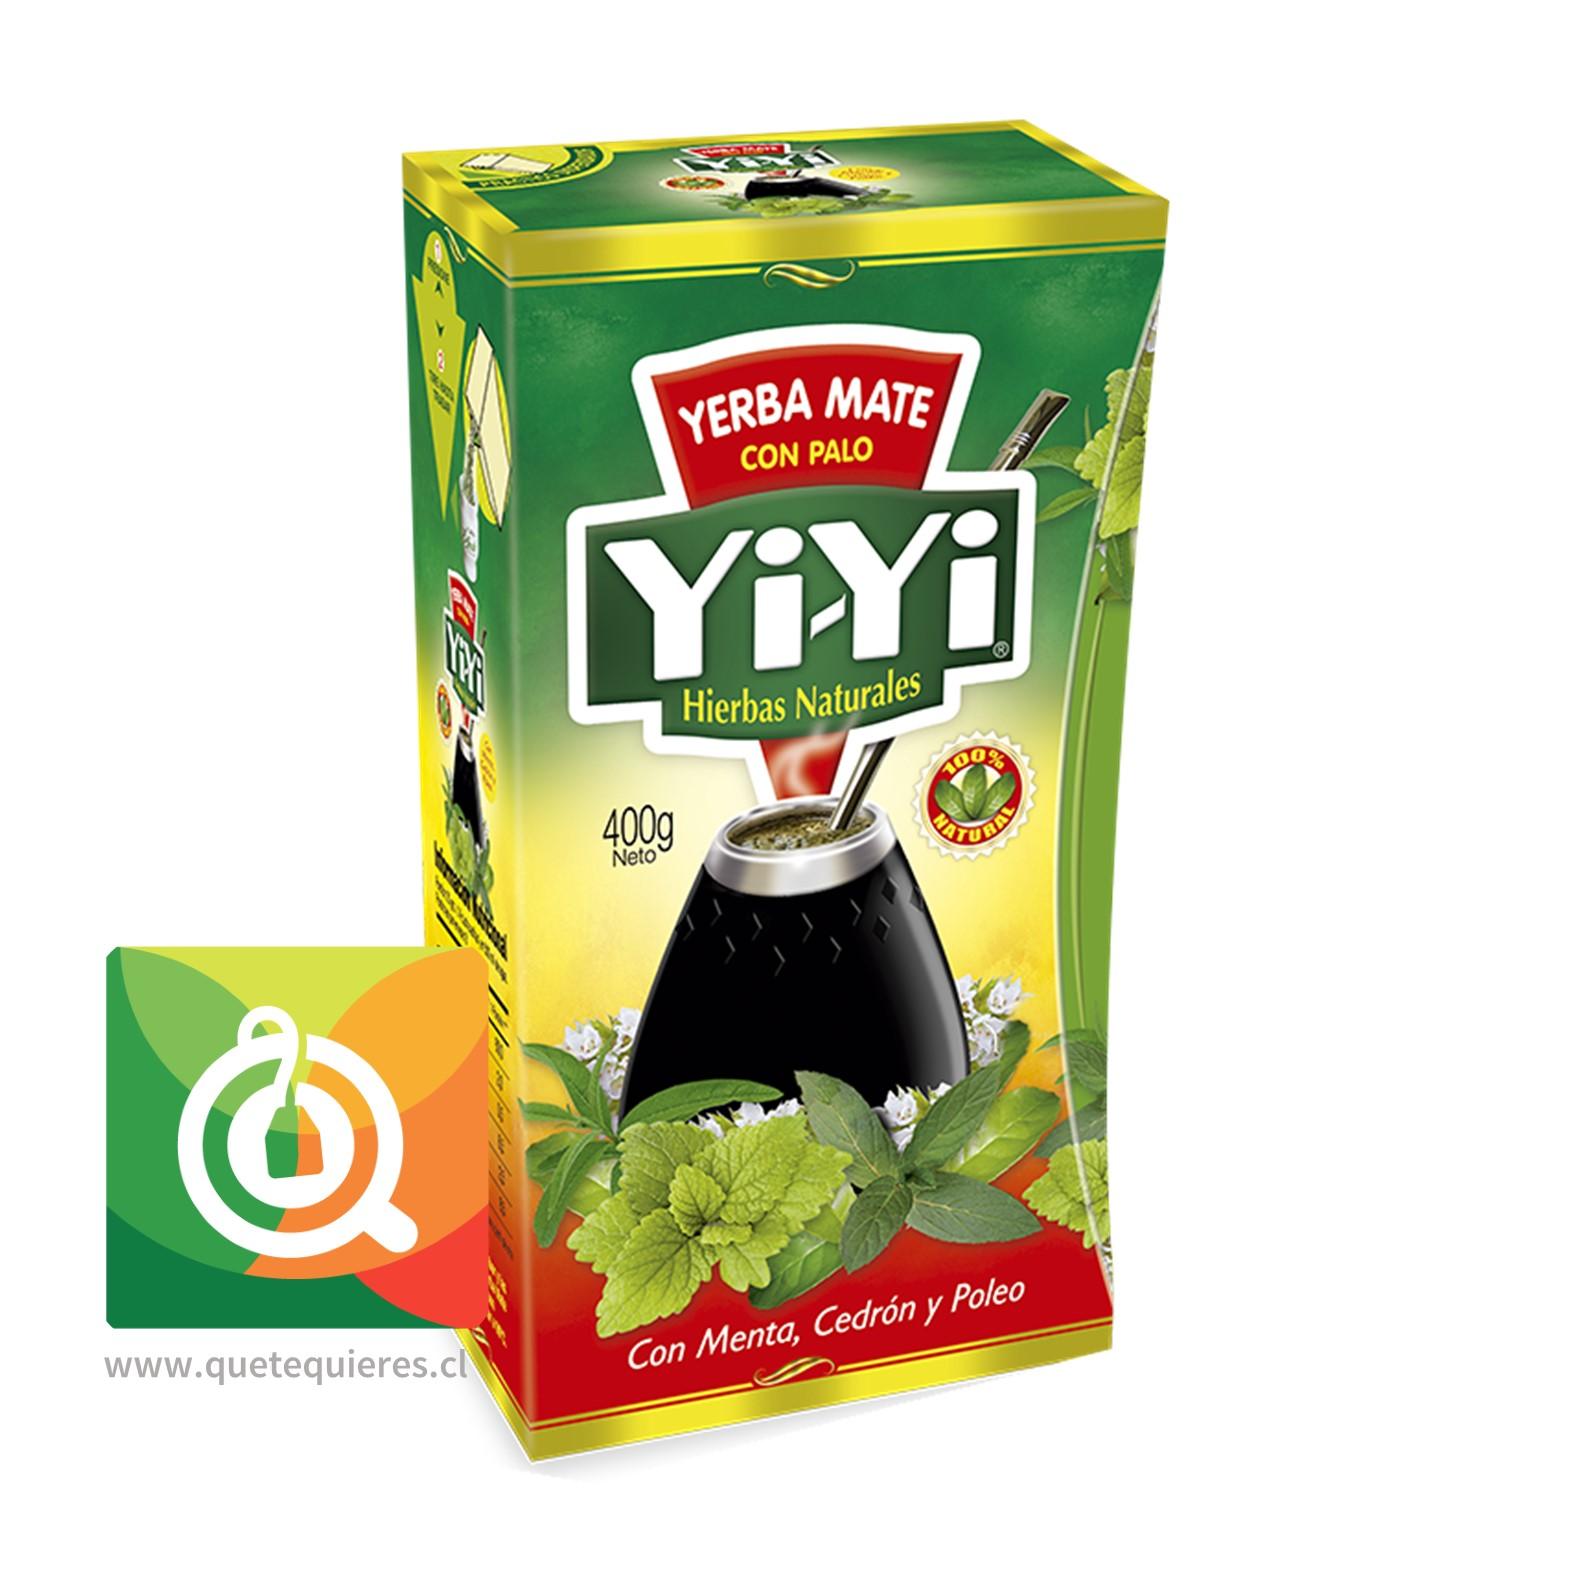 Yi-Yi Yerba Mate Compuesta Menta Cedrón y Poleo